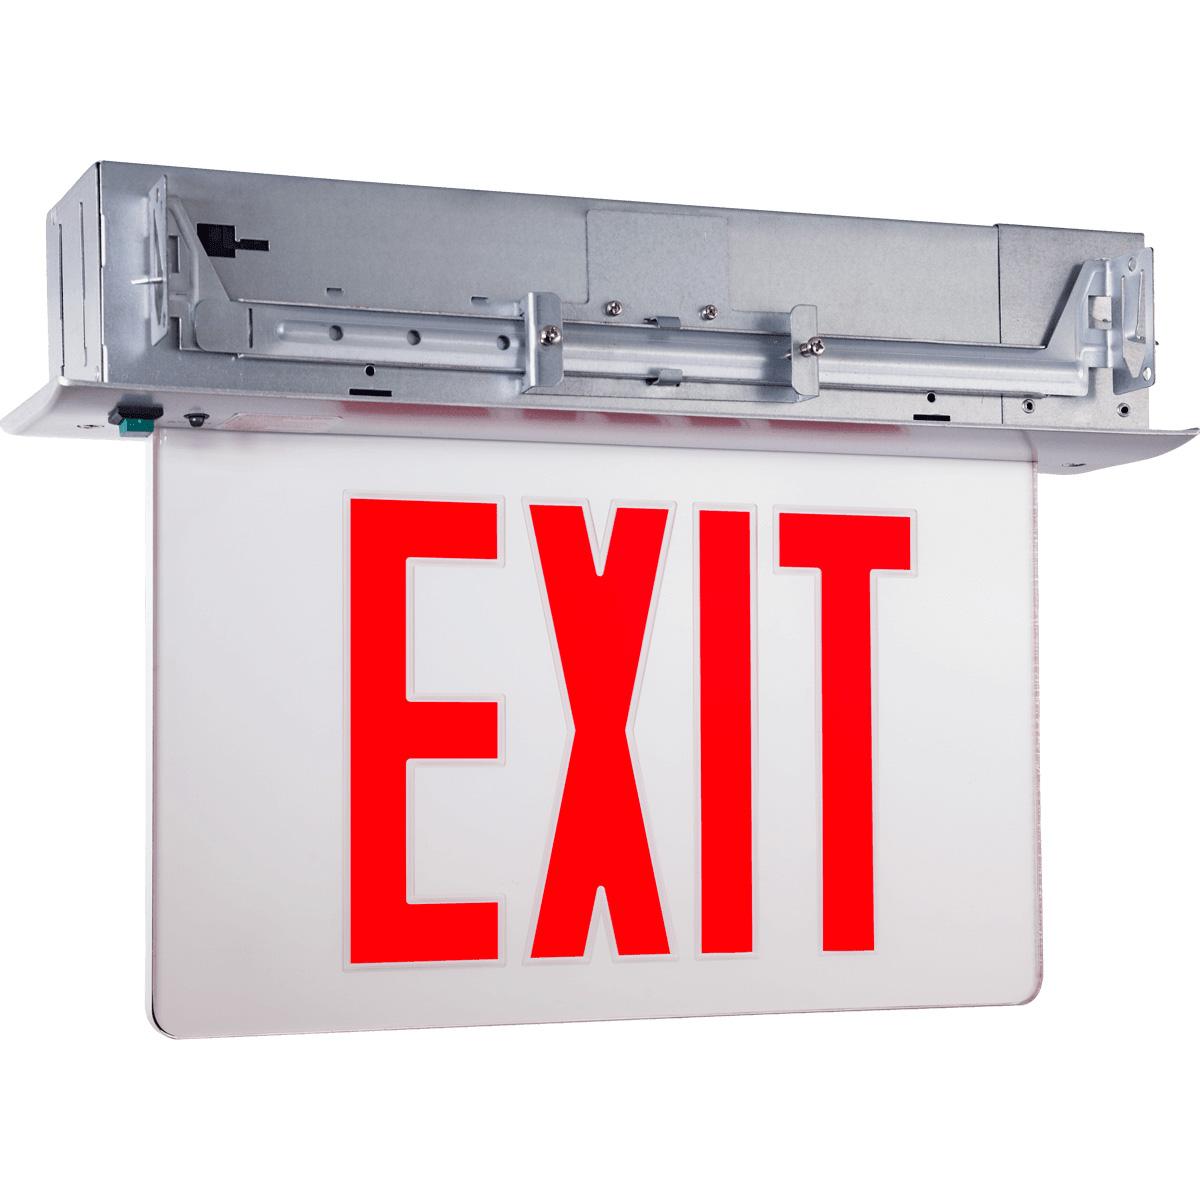 Recessed Edgelit Exit Sign Featuring Trim Options: Series: EEELR